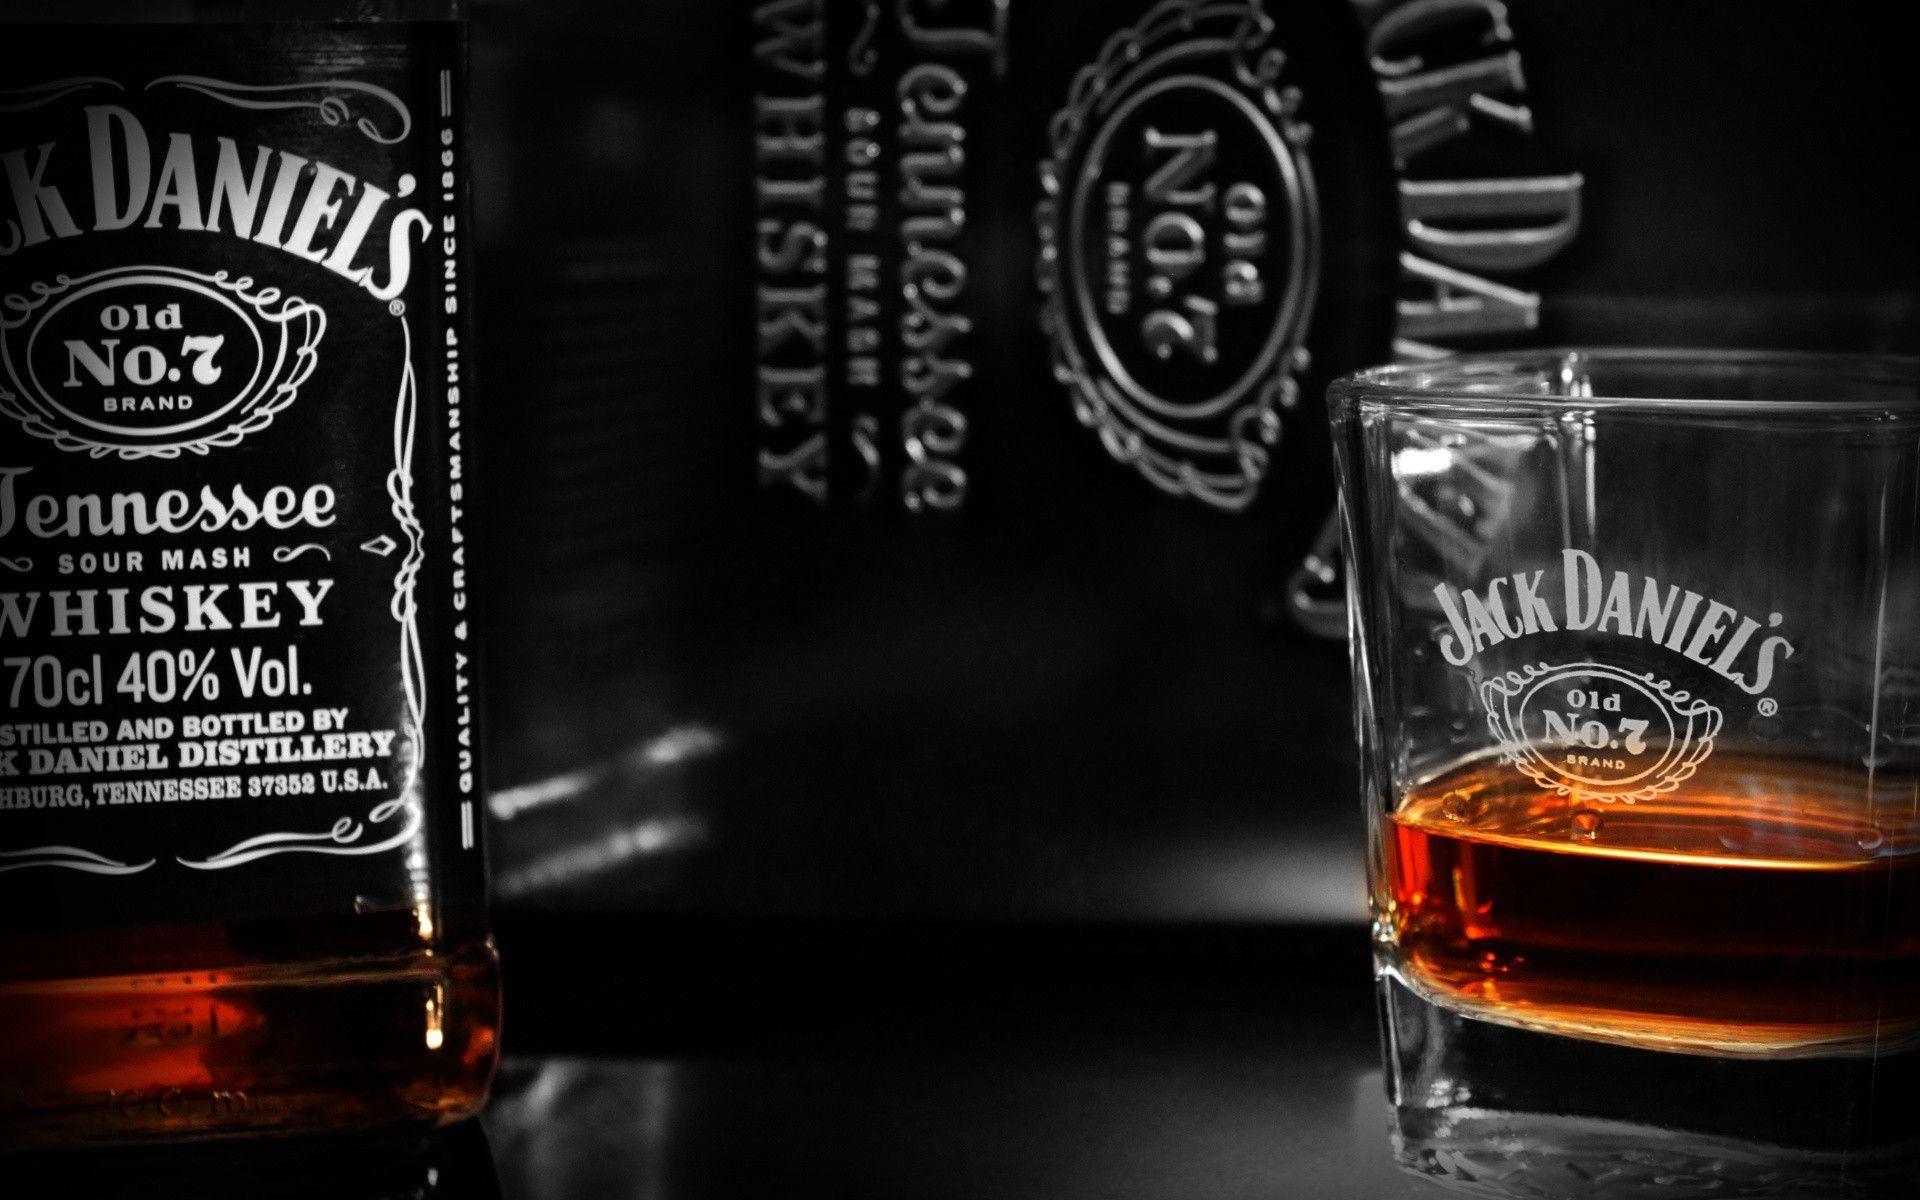 Jack Daniels widescreen wallpapers